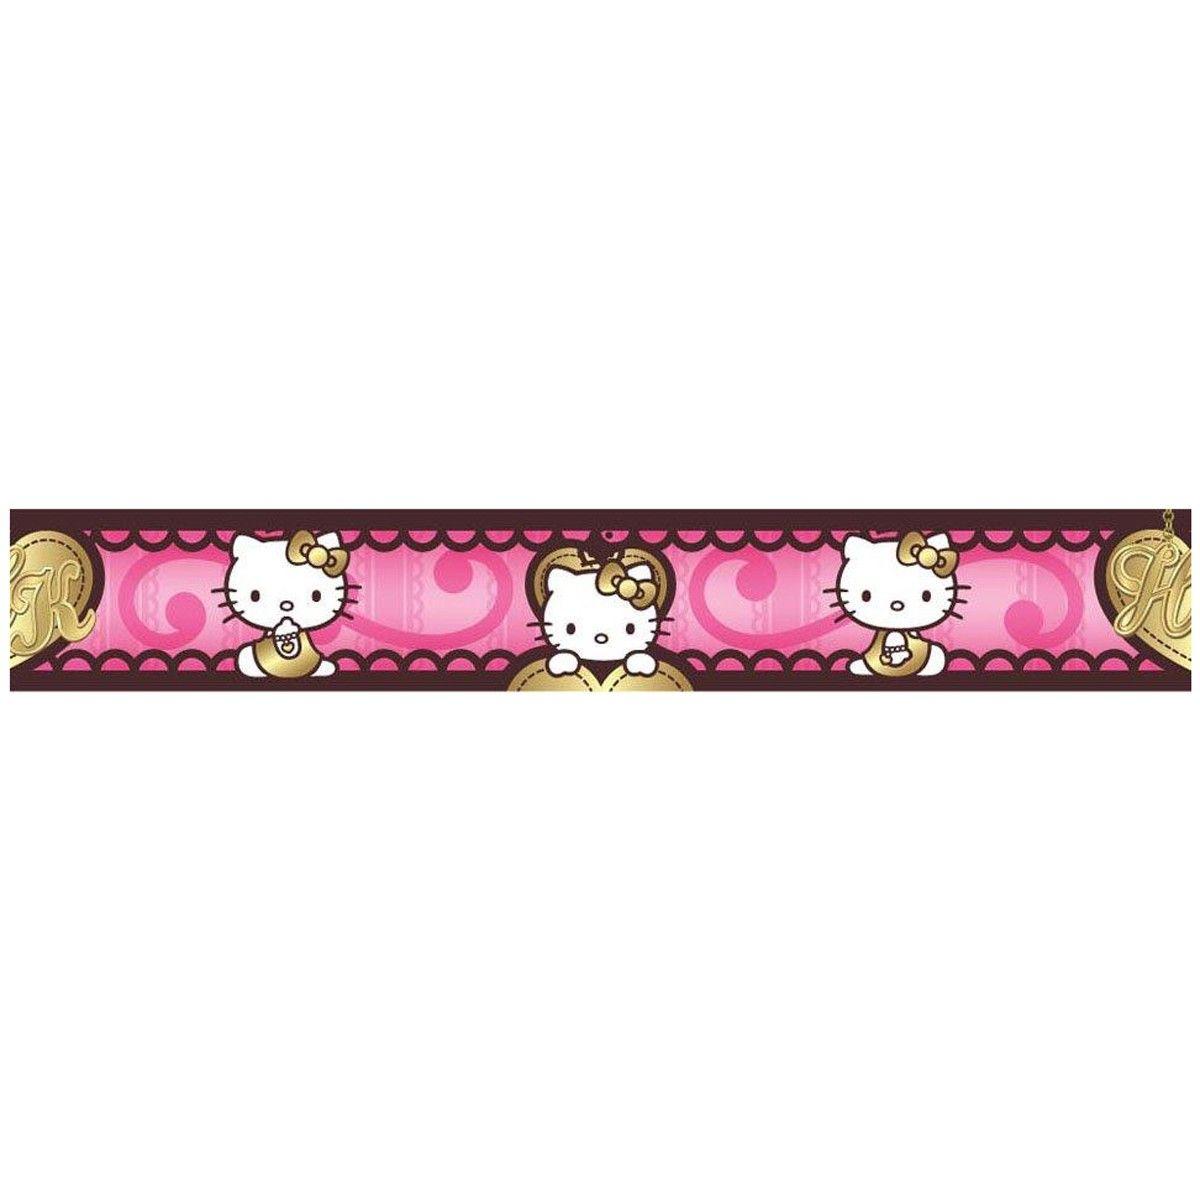 Top Wallpaper Hello Kitty Wall - f12aba3e8ae478460951cbd56a091b89  Picture_55643.jpg